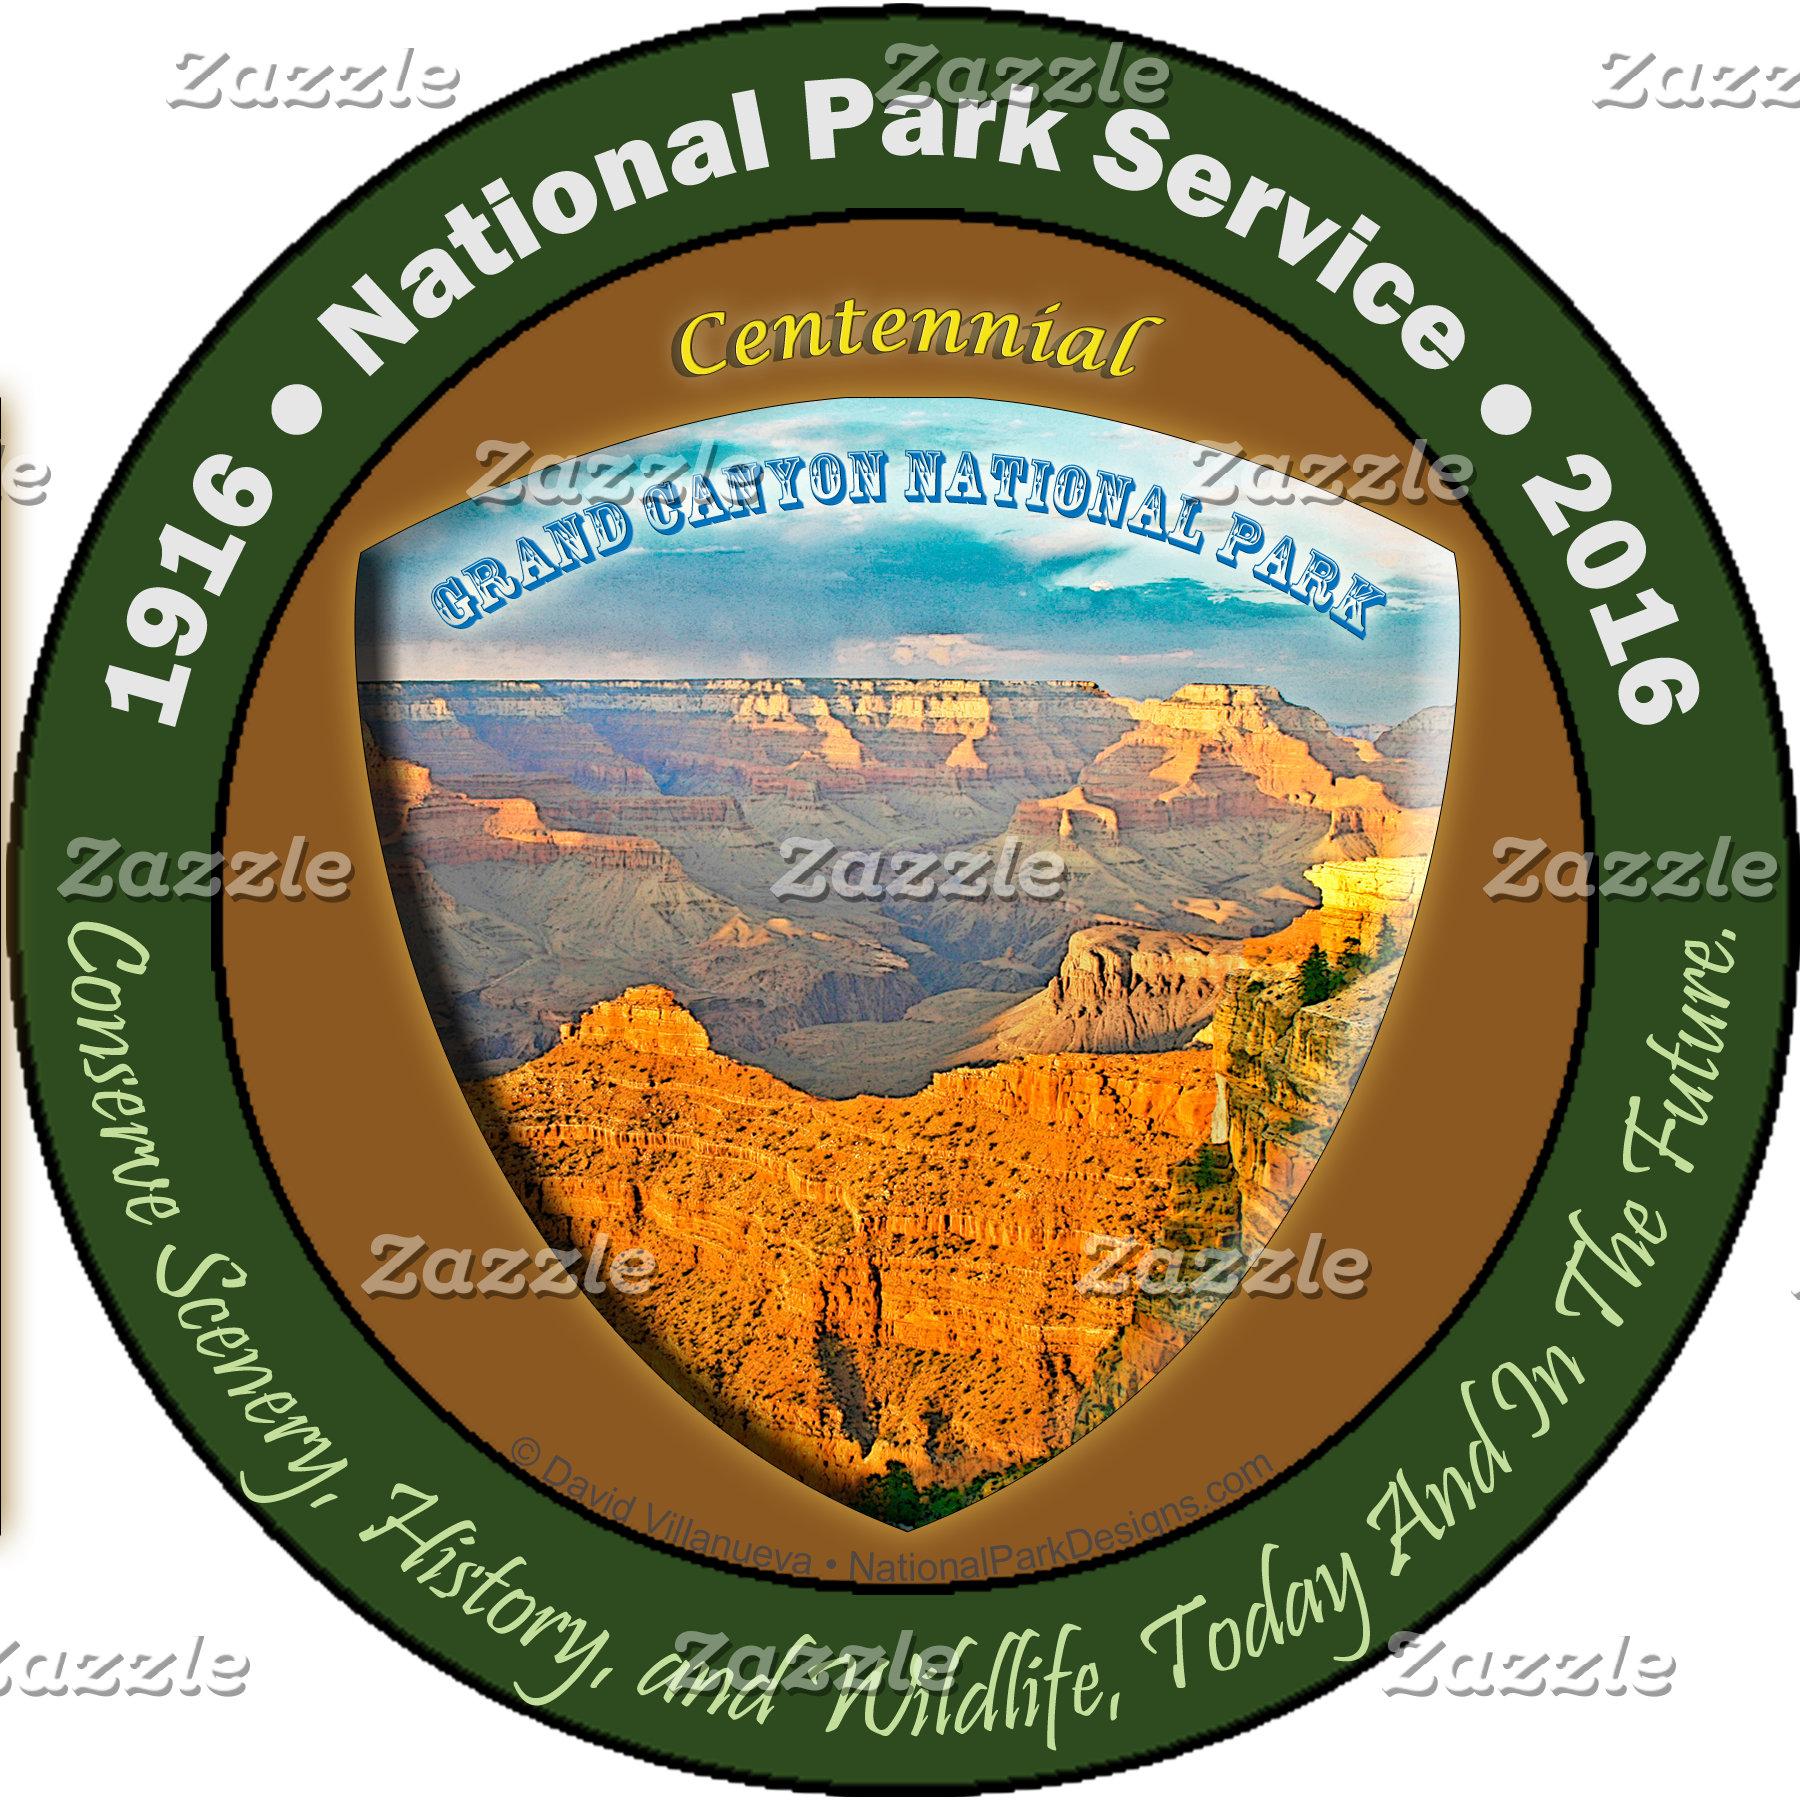 NPS Centennial - Grand Canyon View